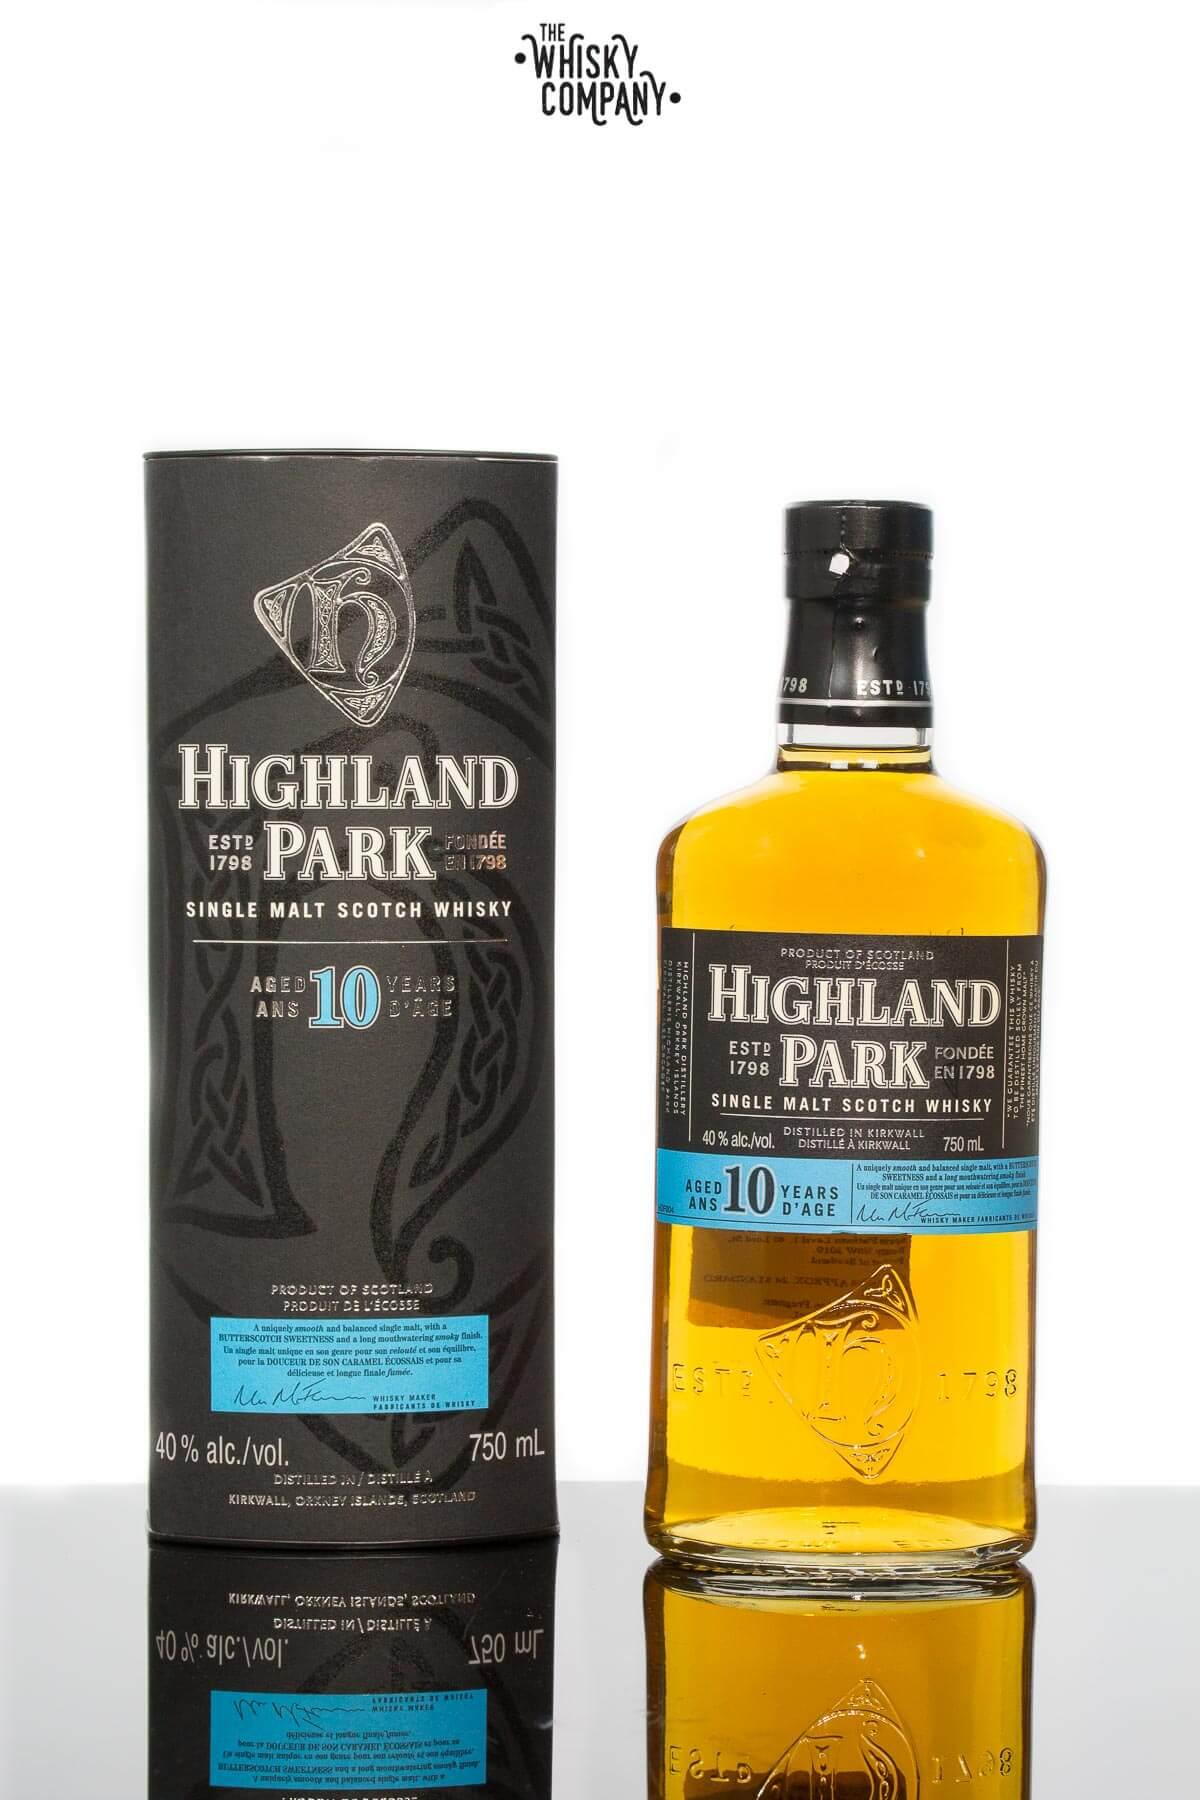 Highland Park Aged 10 Years Island Single Malt Scotch Whisky